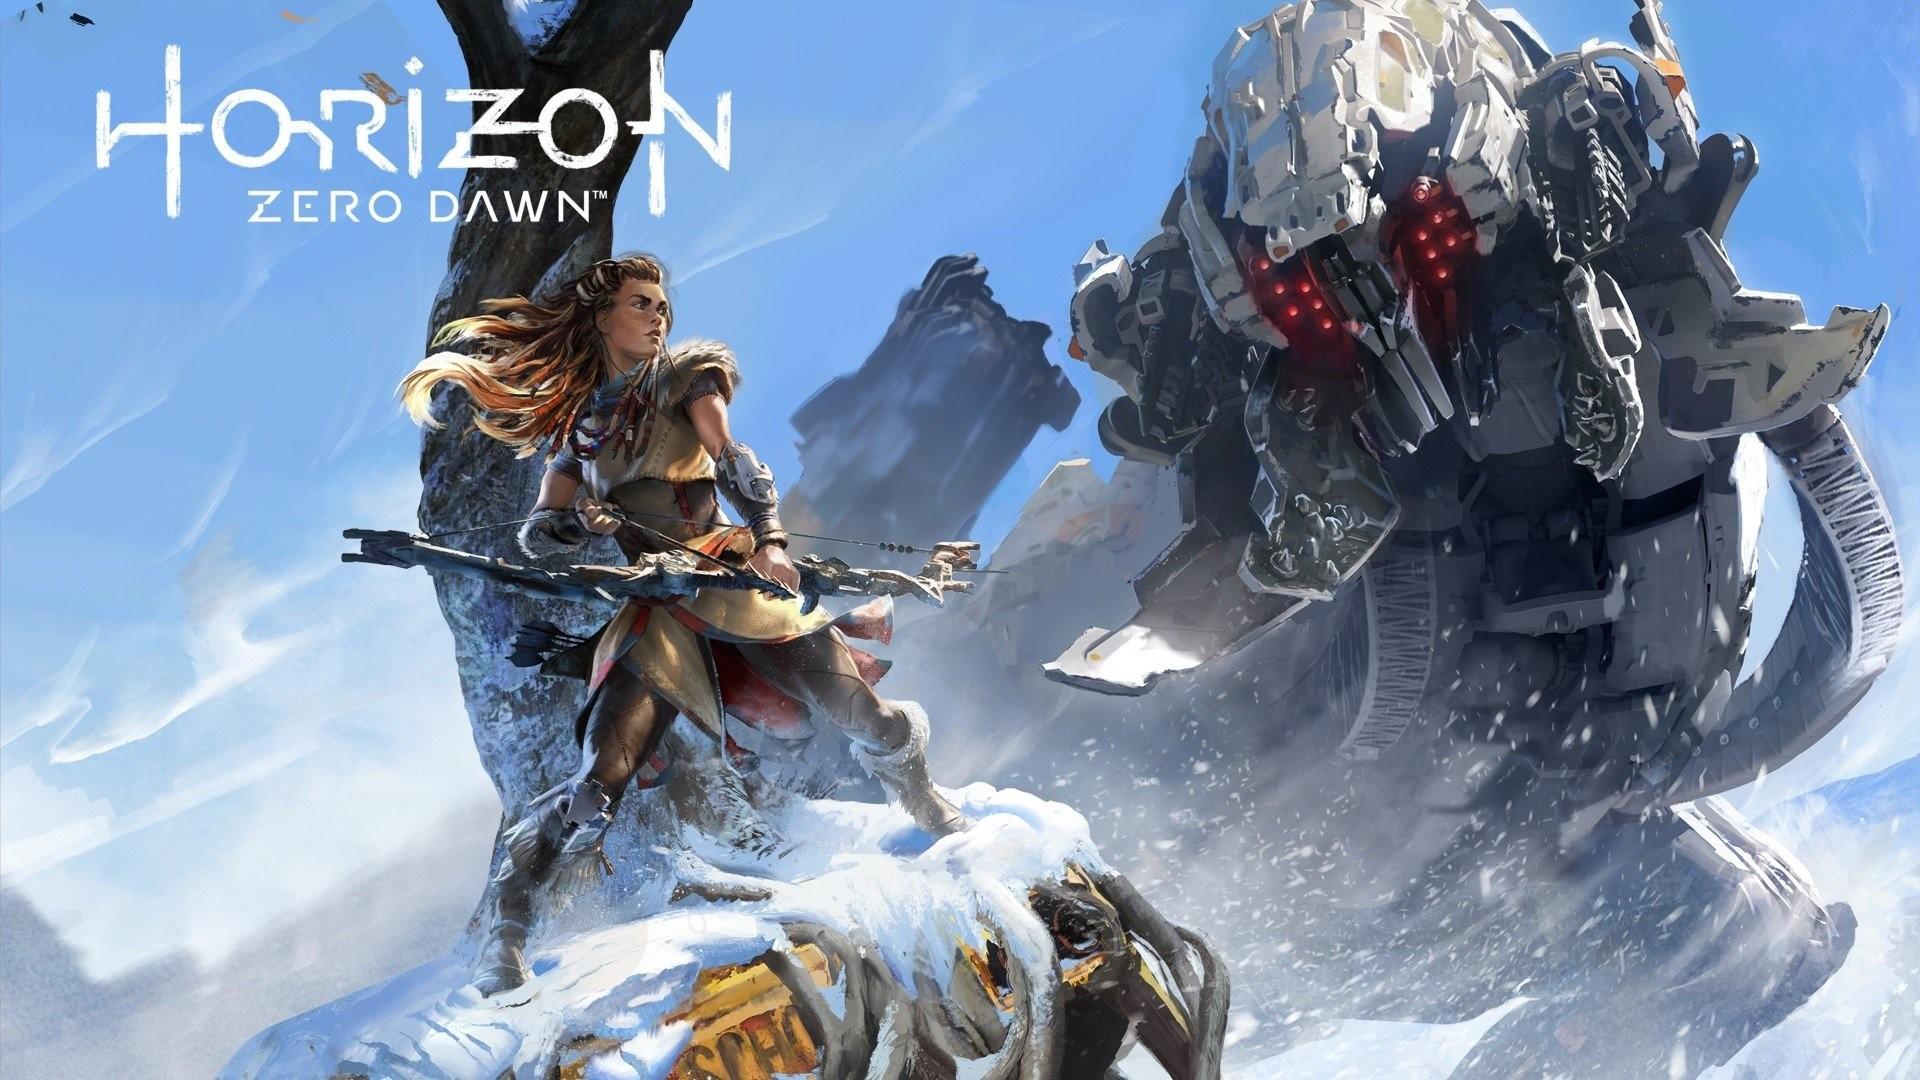 Horizon Zero Dawn Wallpaper Download Free Hd Wallpapers For